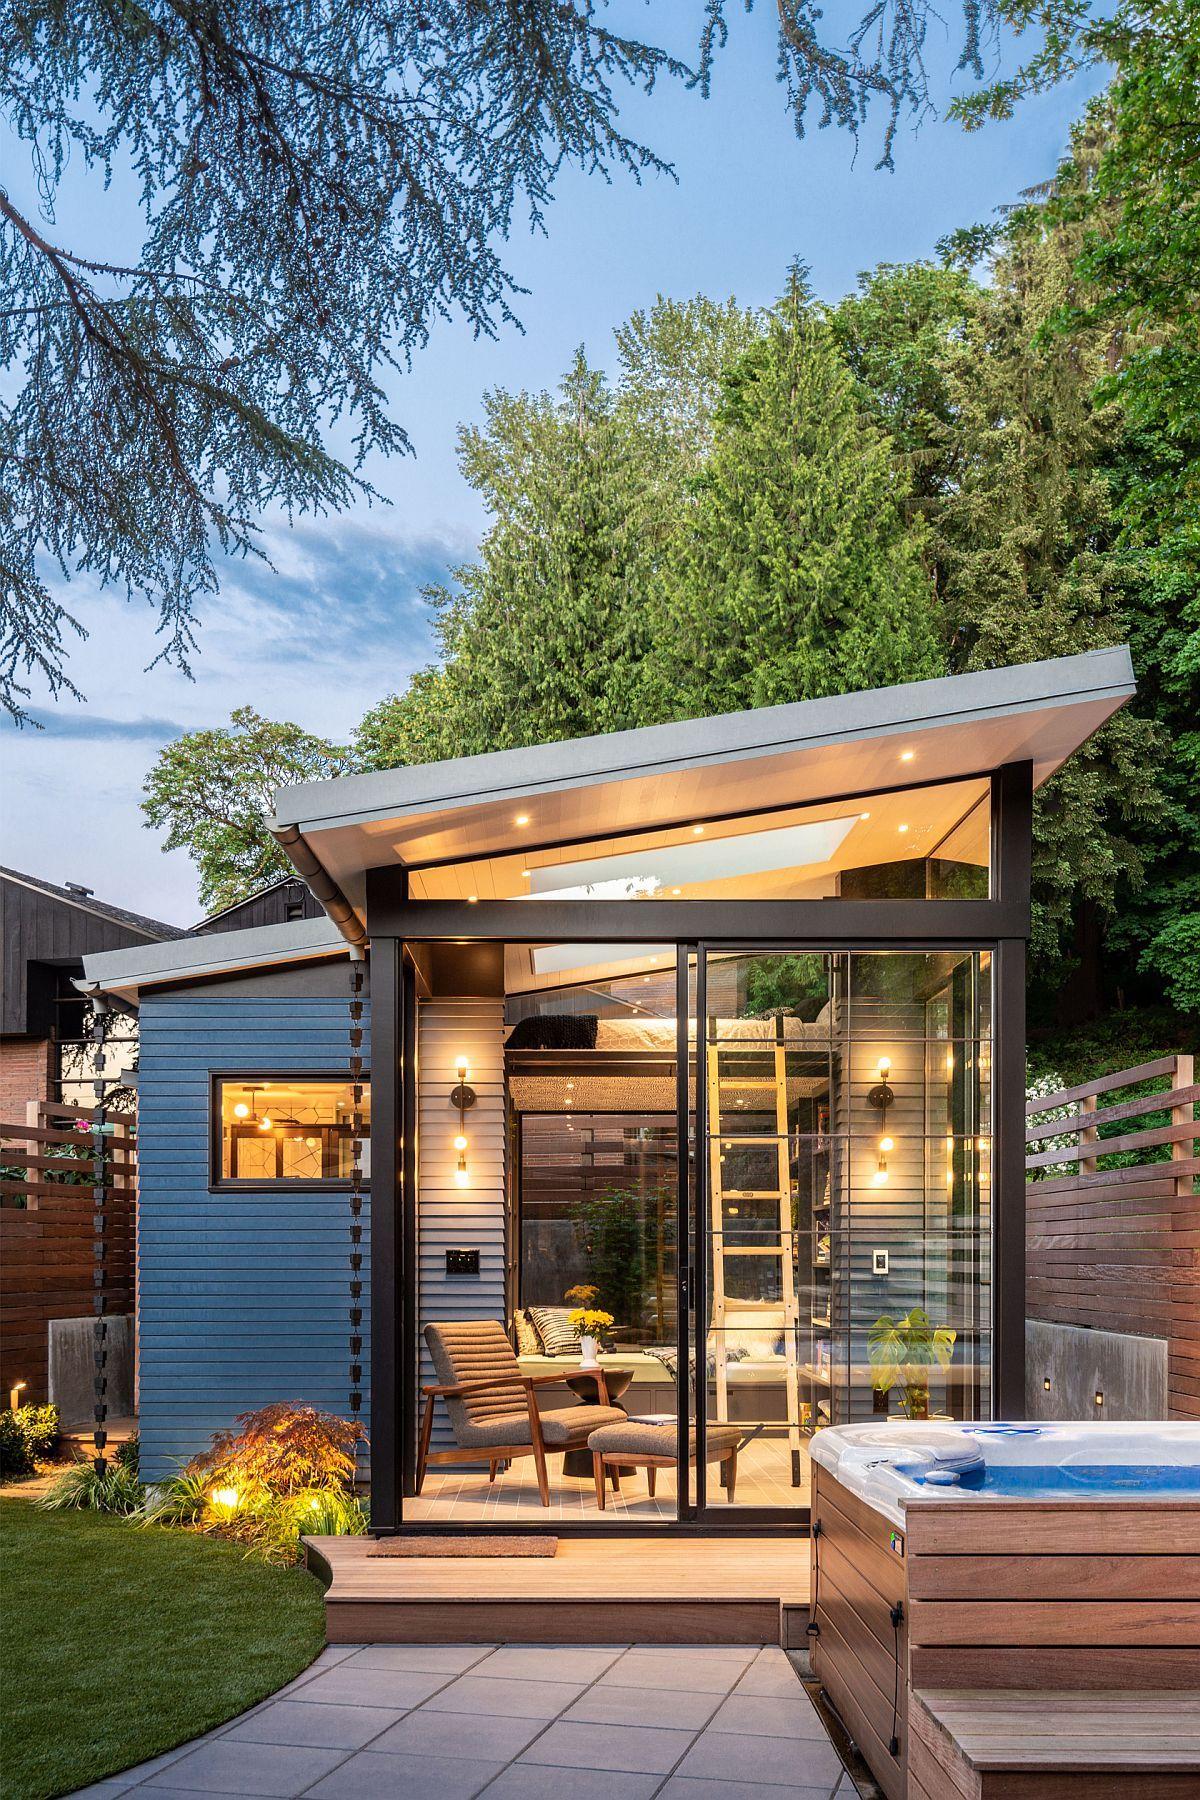 Sensational Backyard Reading Retreat Offers A World Of Serene Escape Backyard House Backyard Cottage Backyard Office Modern backyard office plans